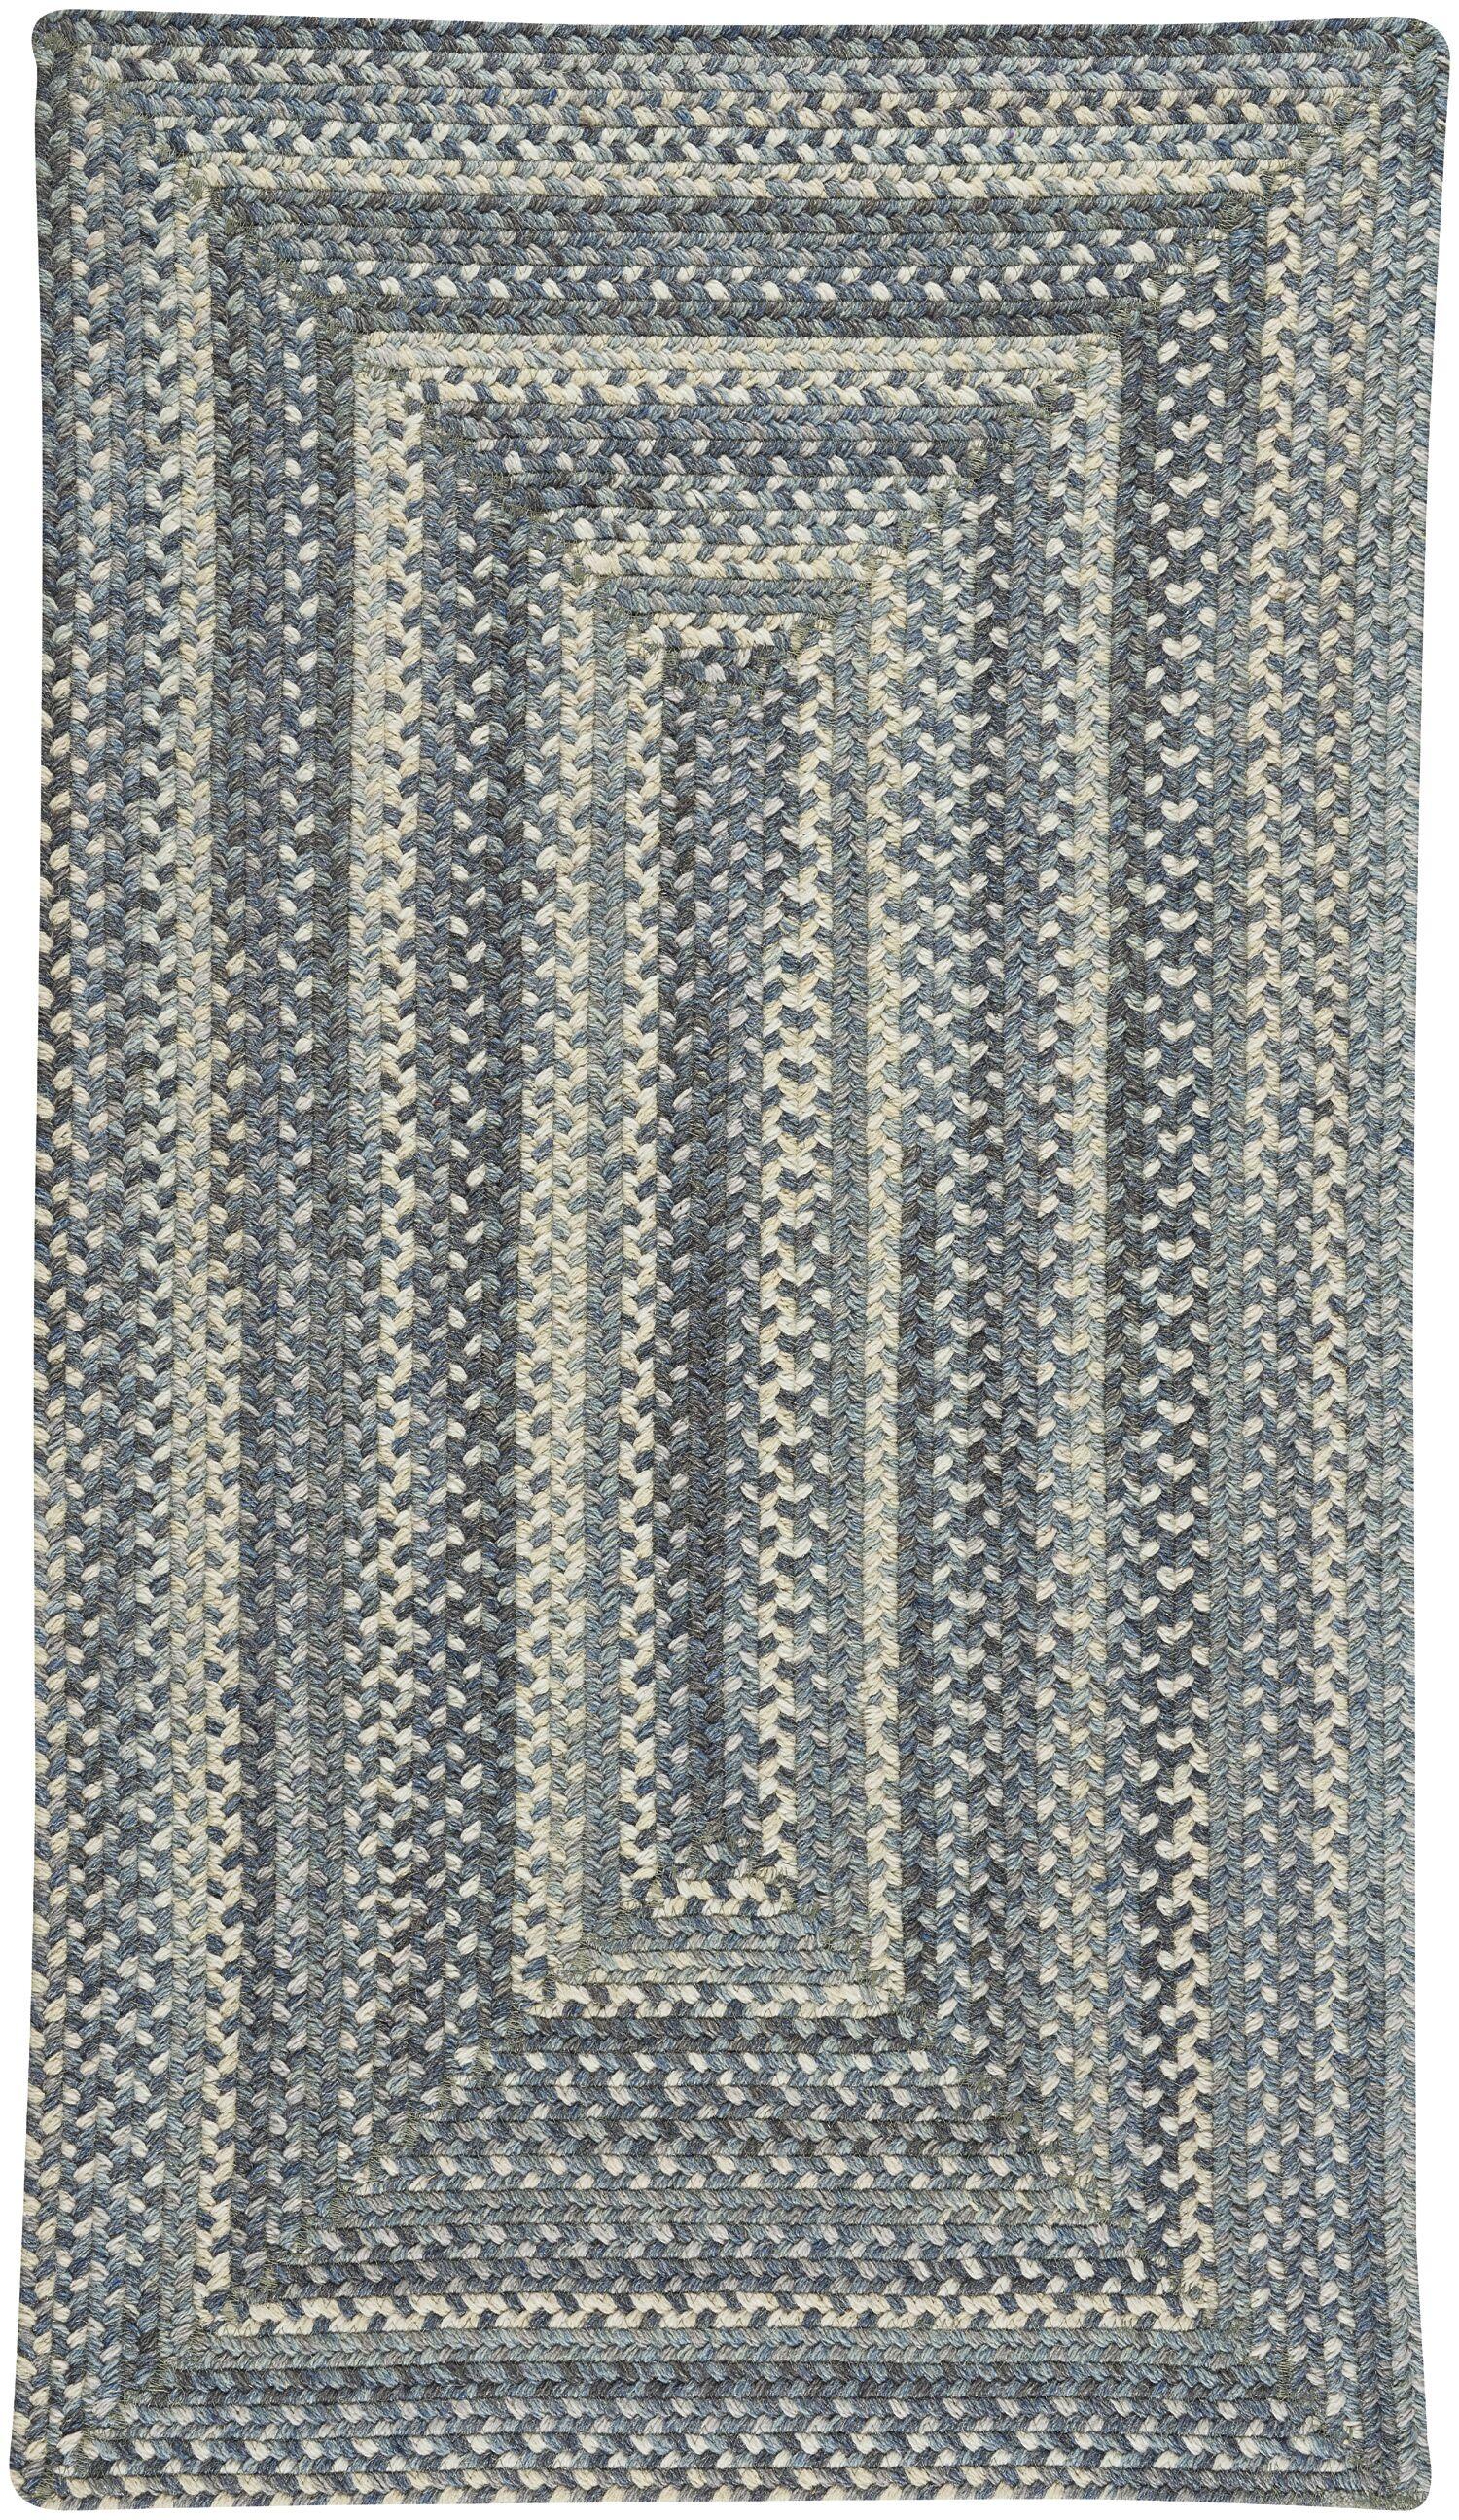 Myrtille Blue Jean Area Rug Rug Size: Rectangle 2'3